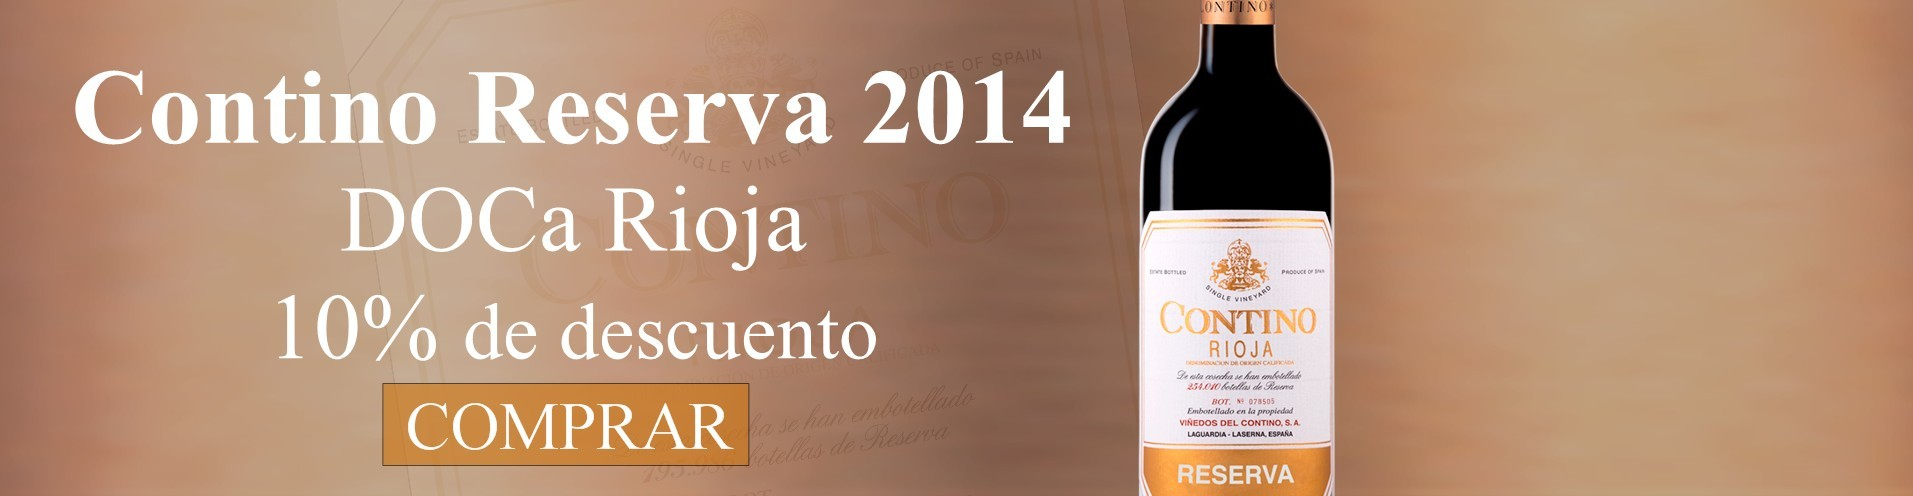 Contino Reserva 2014 - Vino Tinto Rioja Alavesa